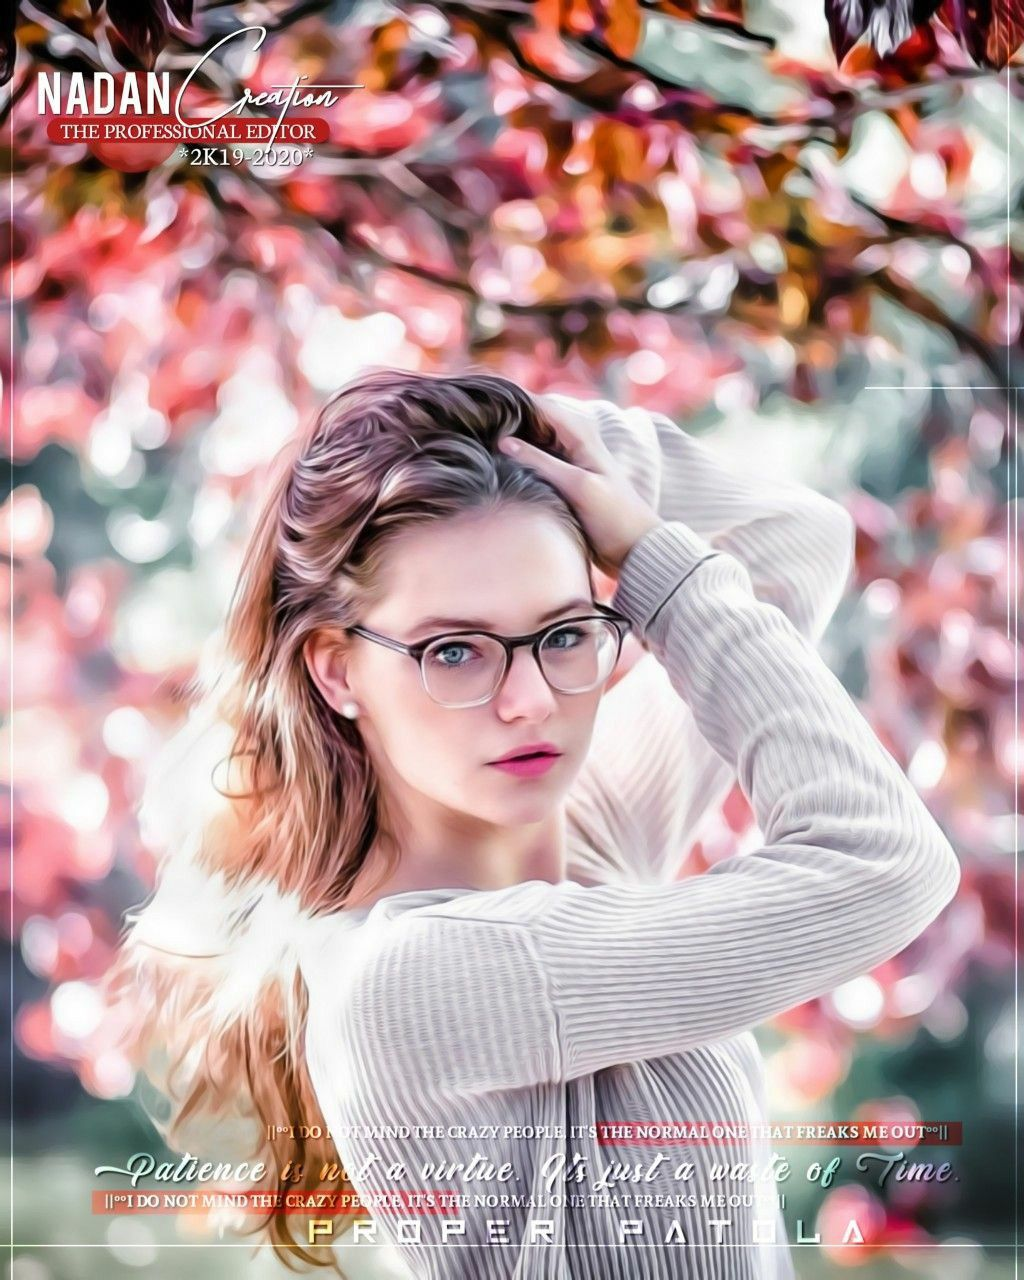 1000+ New Stylish Attitude girls Profile Picture